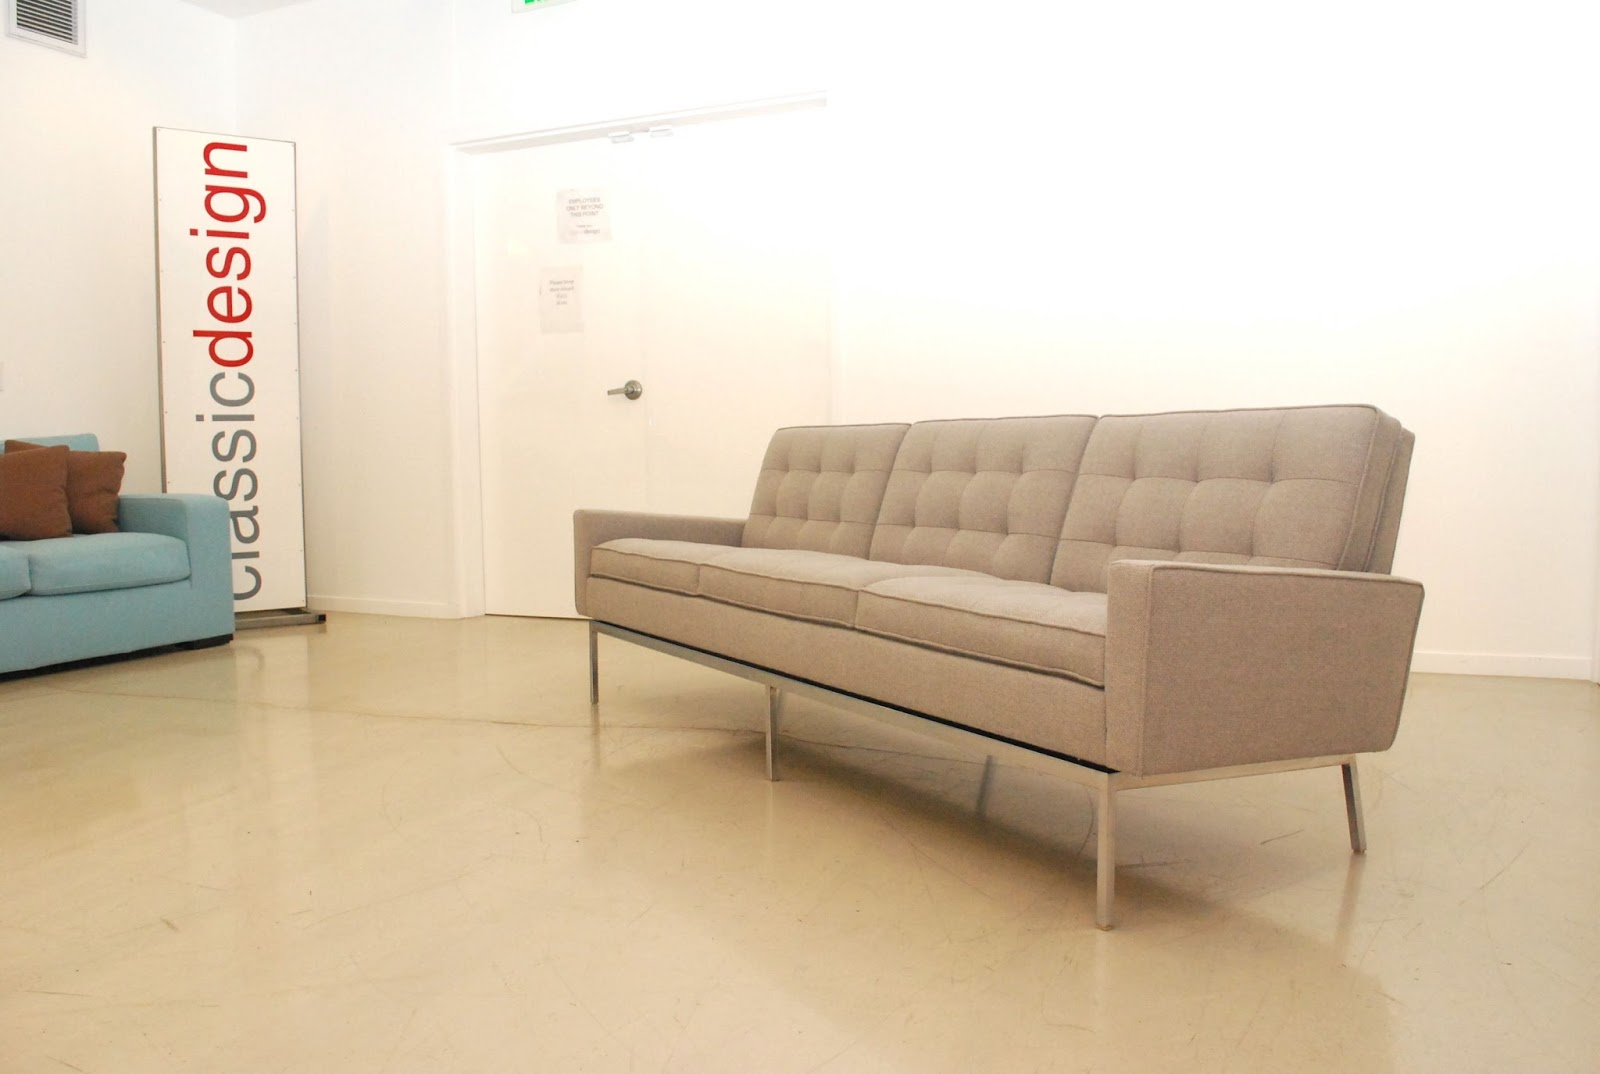 Merveilleux Before U0026 After: Vintage Florence Knoll Sofa